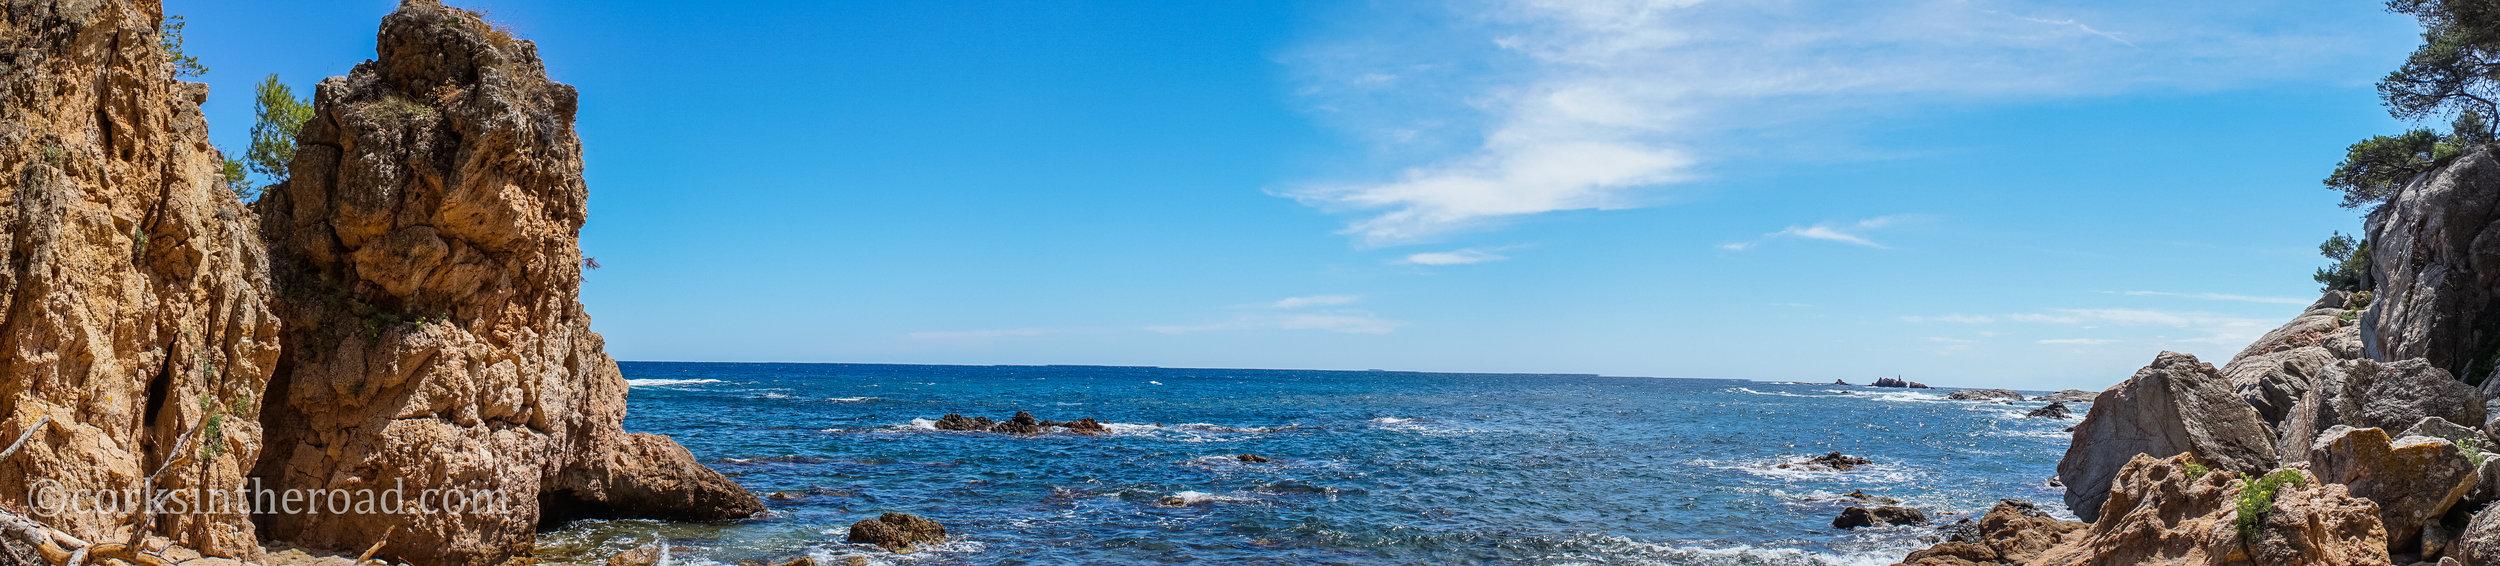 20160810Barcelona, Corksintheroad, Costa Brava, Costa Brava Landscape, Panorama.jpg